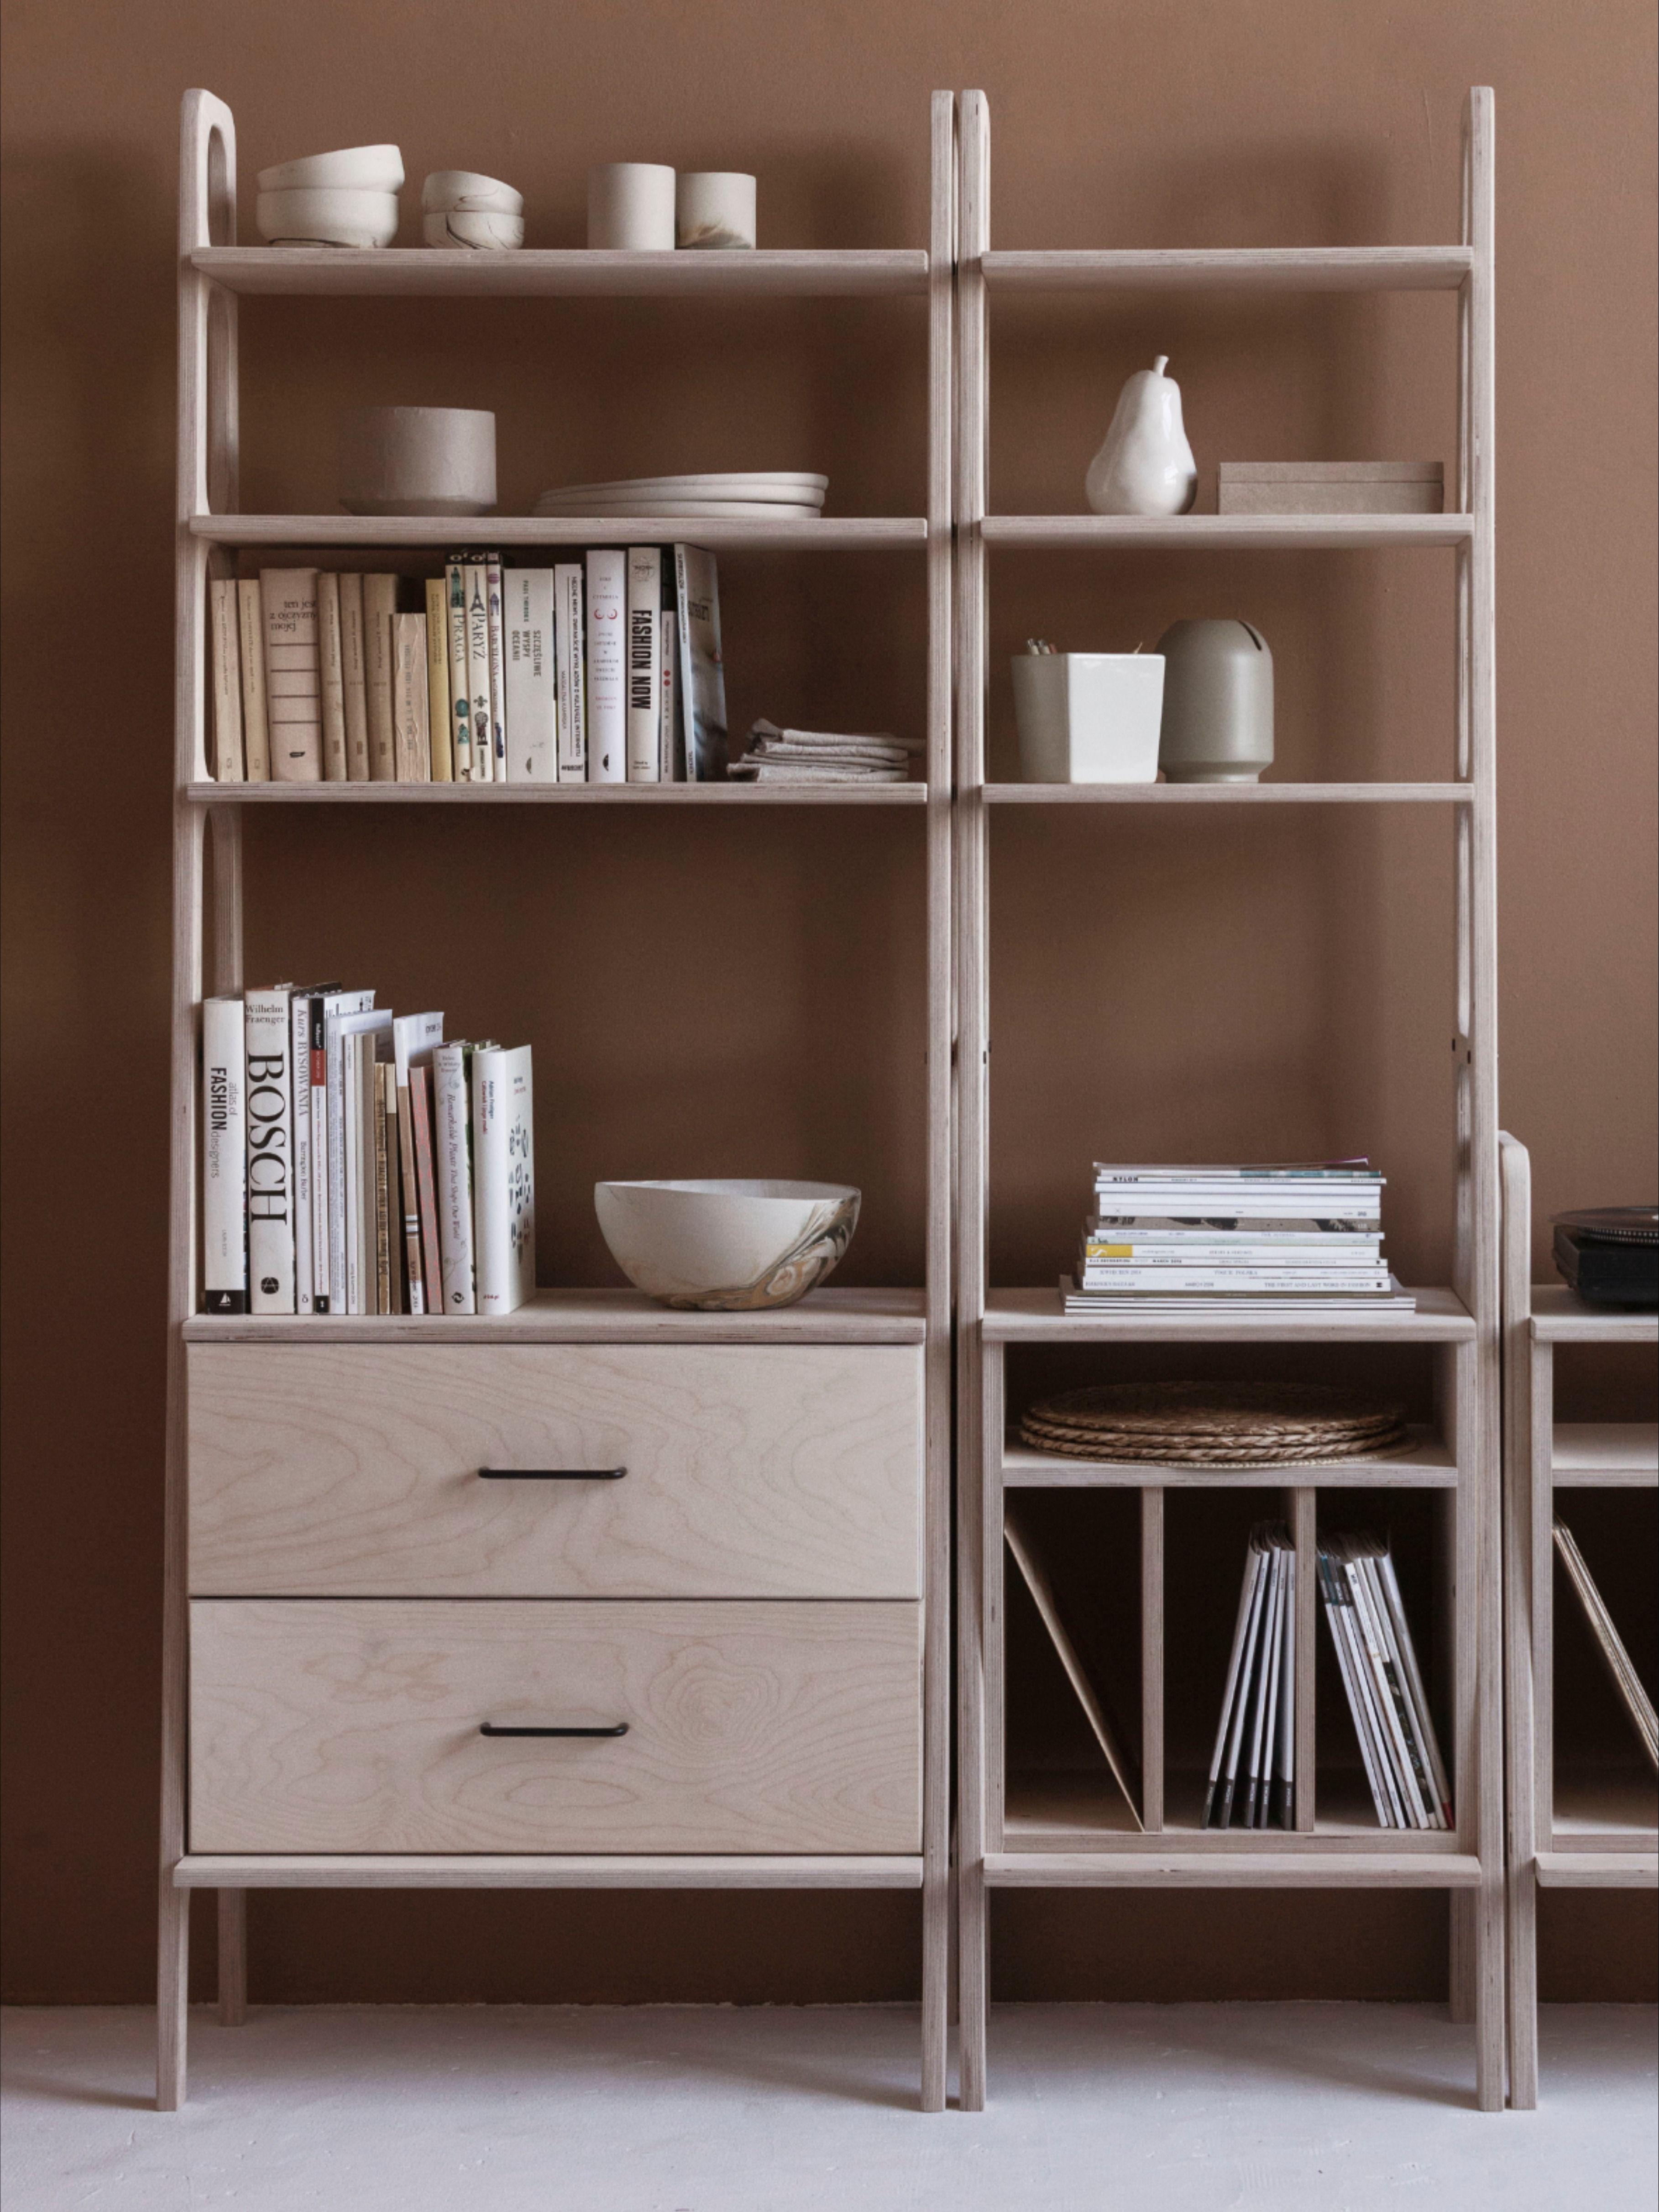 45 Amazing Scandinavian Ideas For Your Home Library Bookshelves Diy Interior Bookshelf Storage